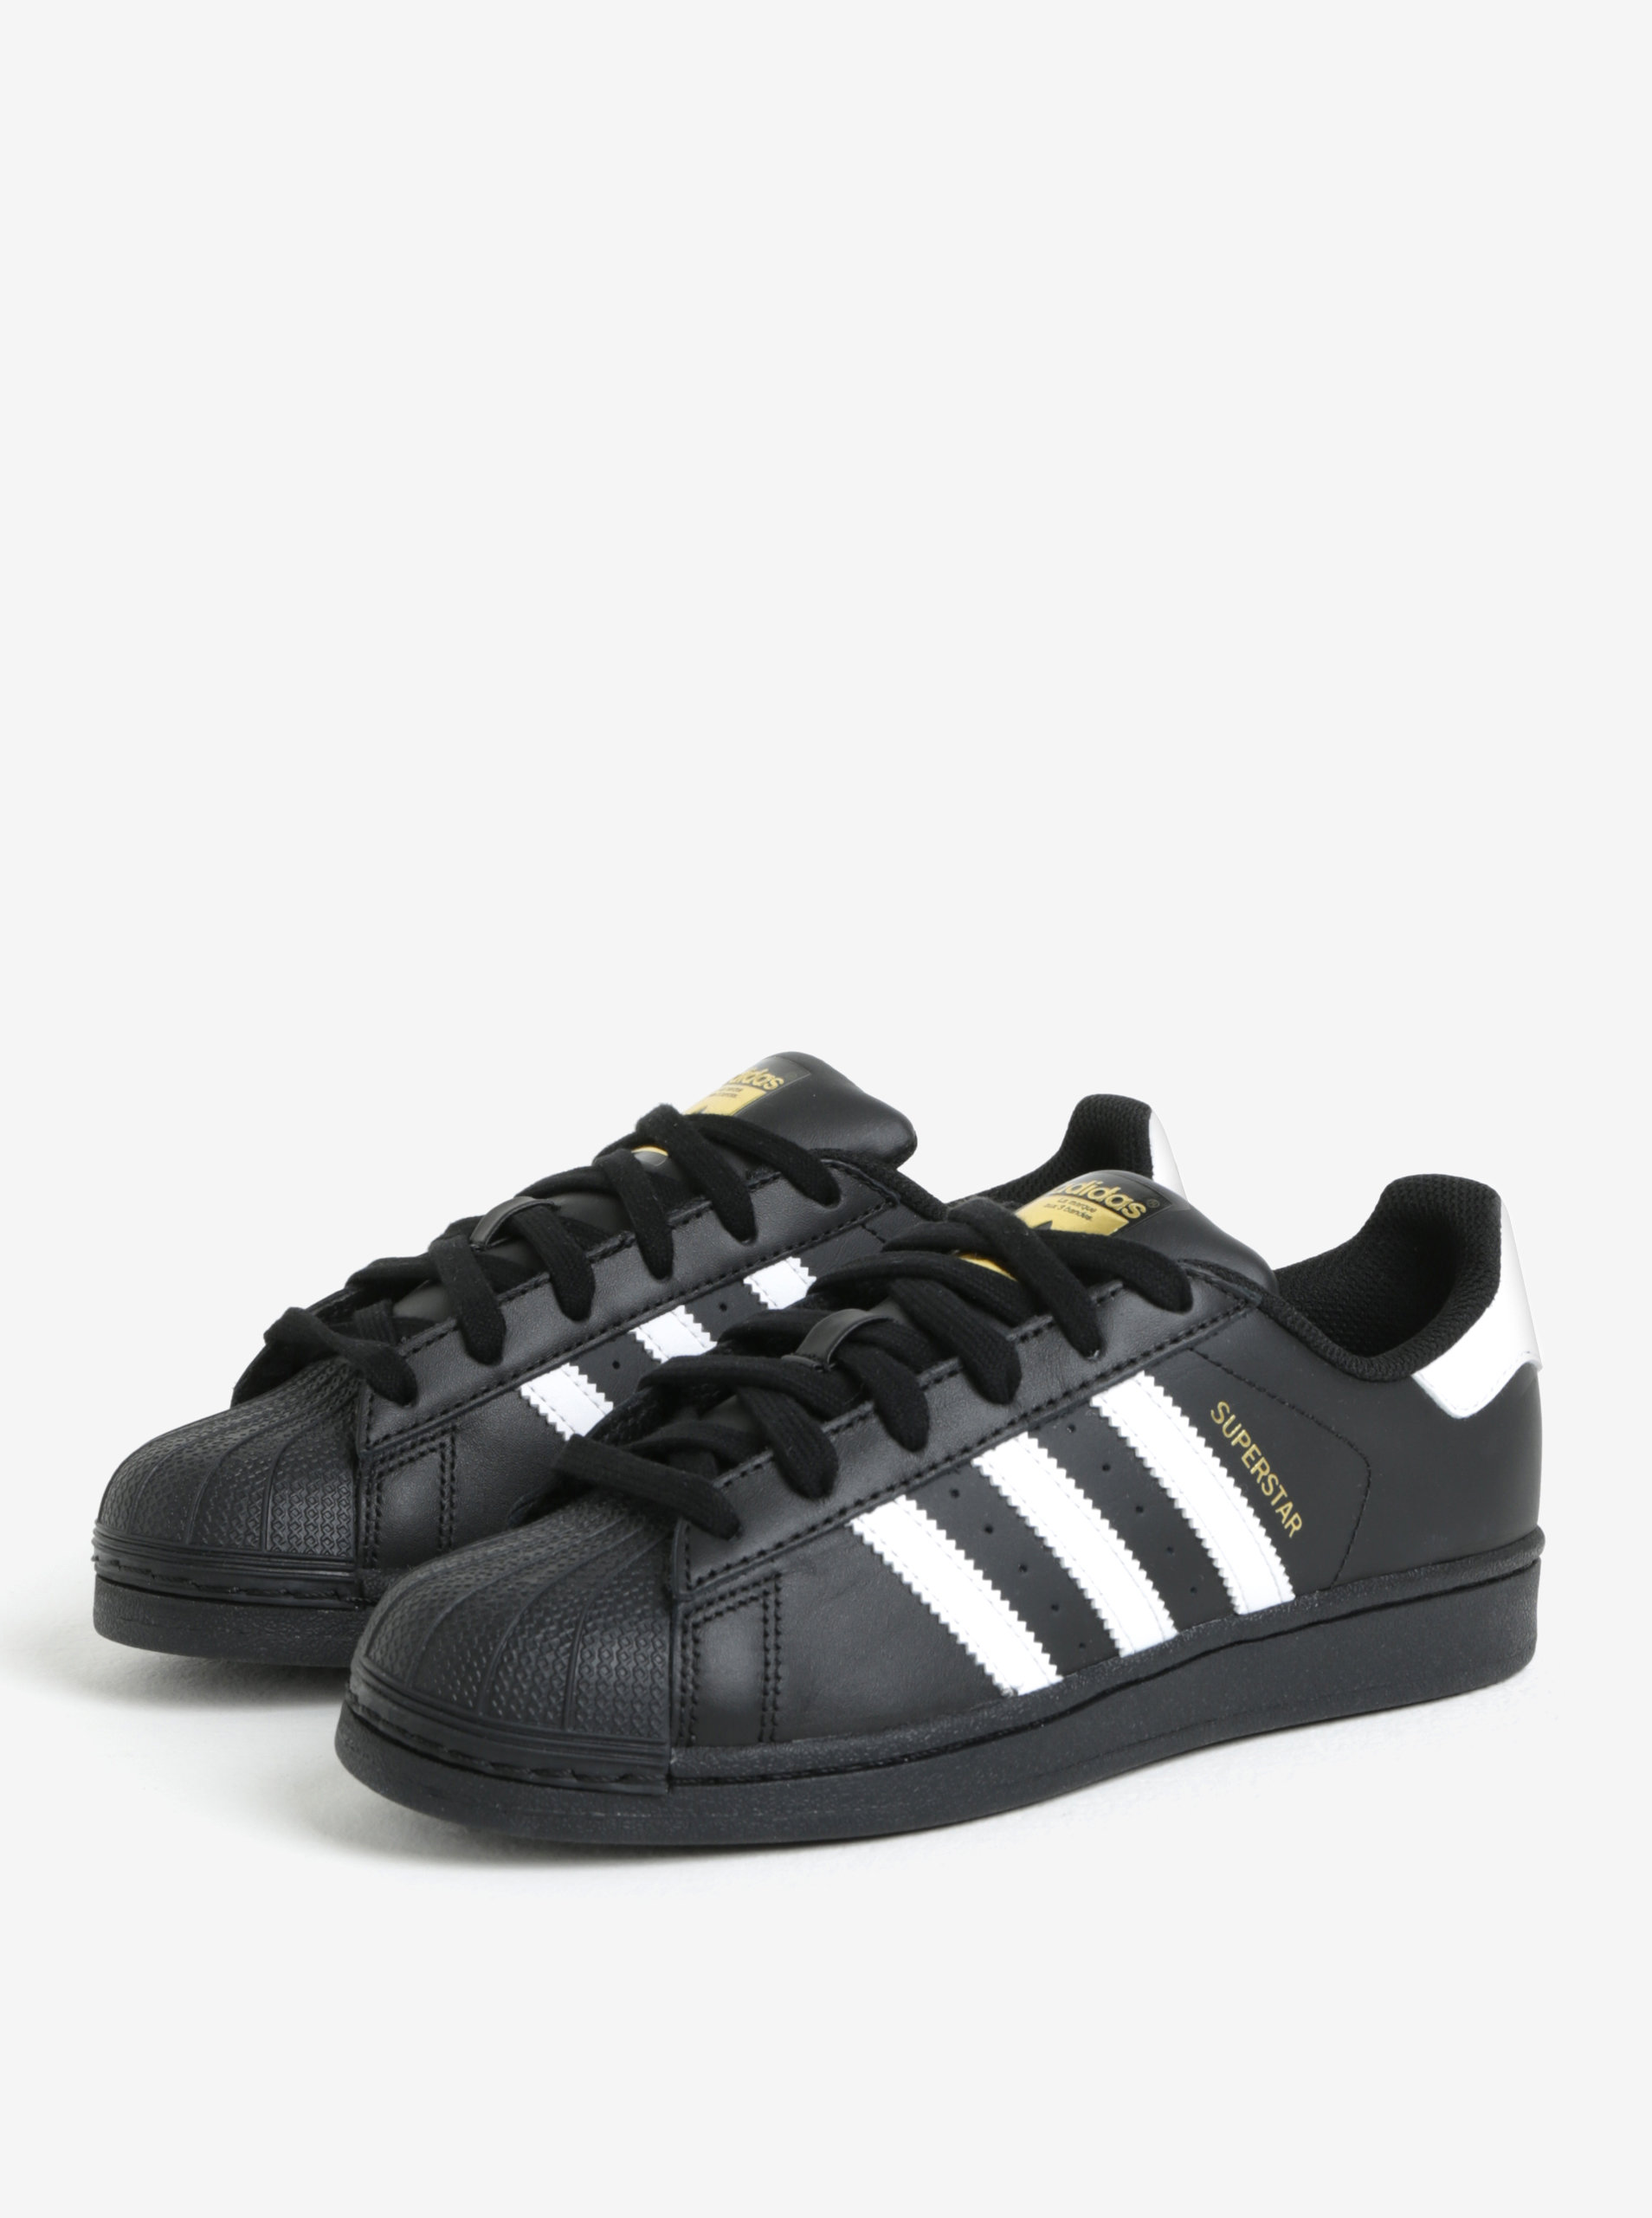 Černé kožené tenisky adidas Originals Superstar ... 6004e10b08